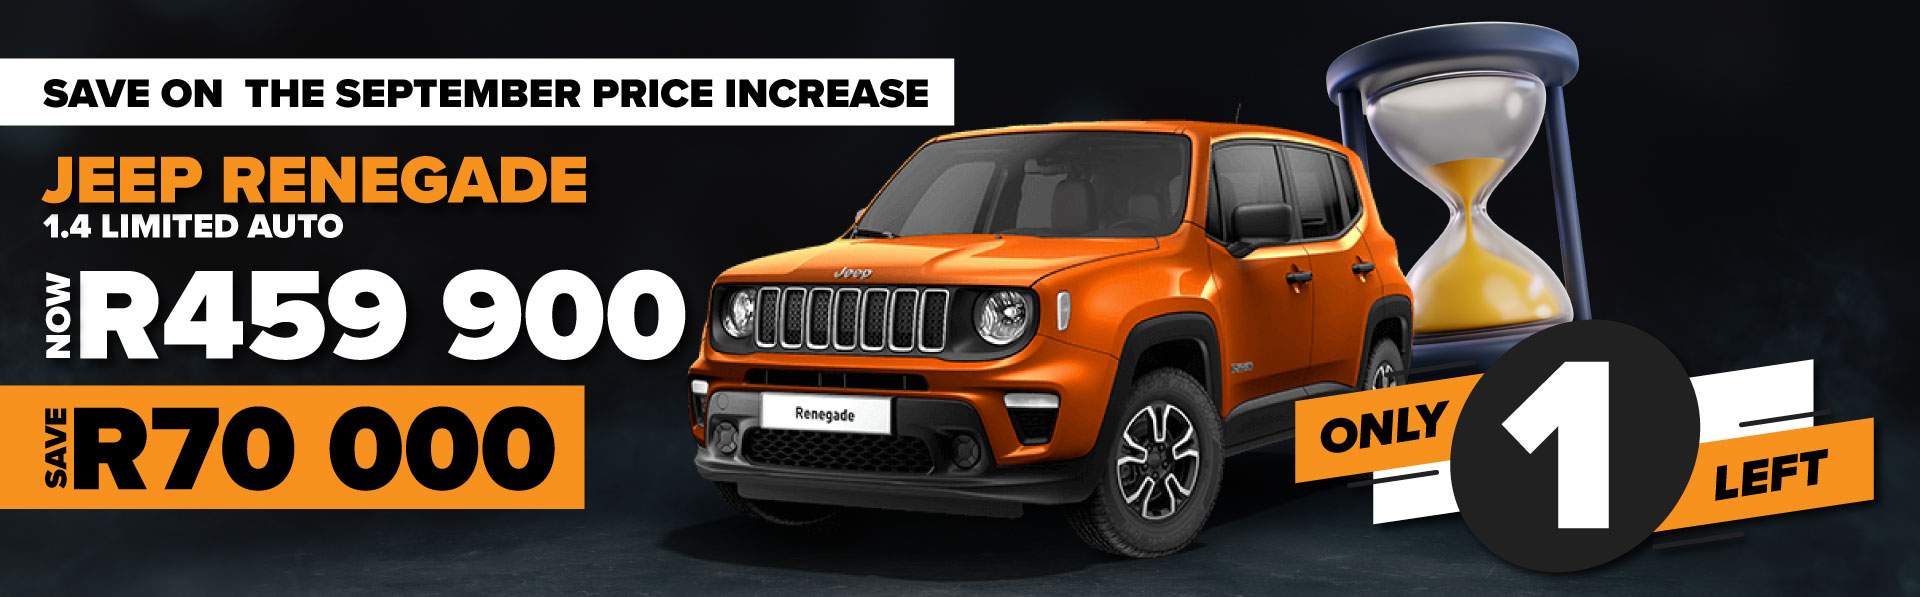 jeep-renegade-at